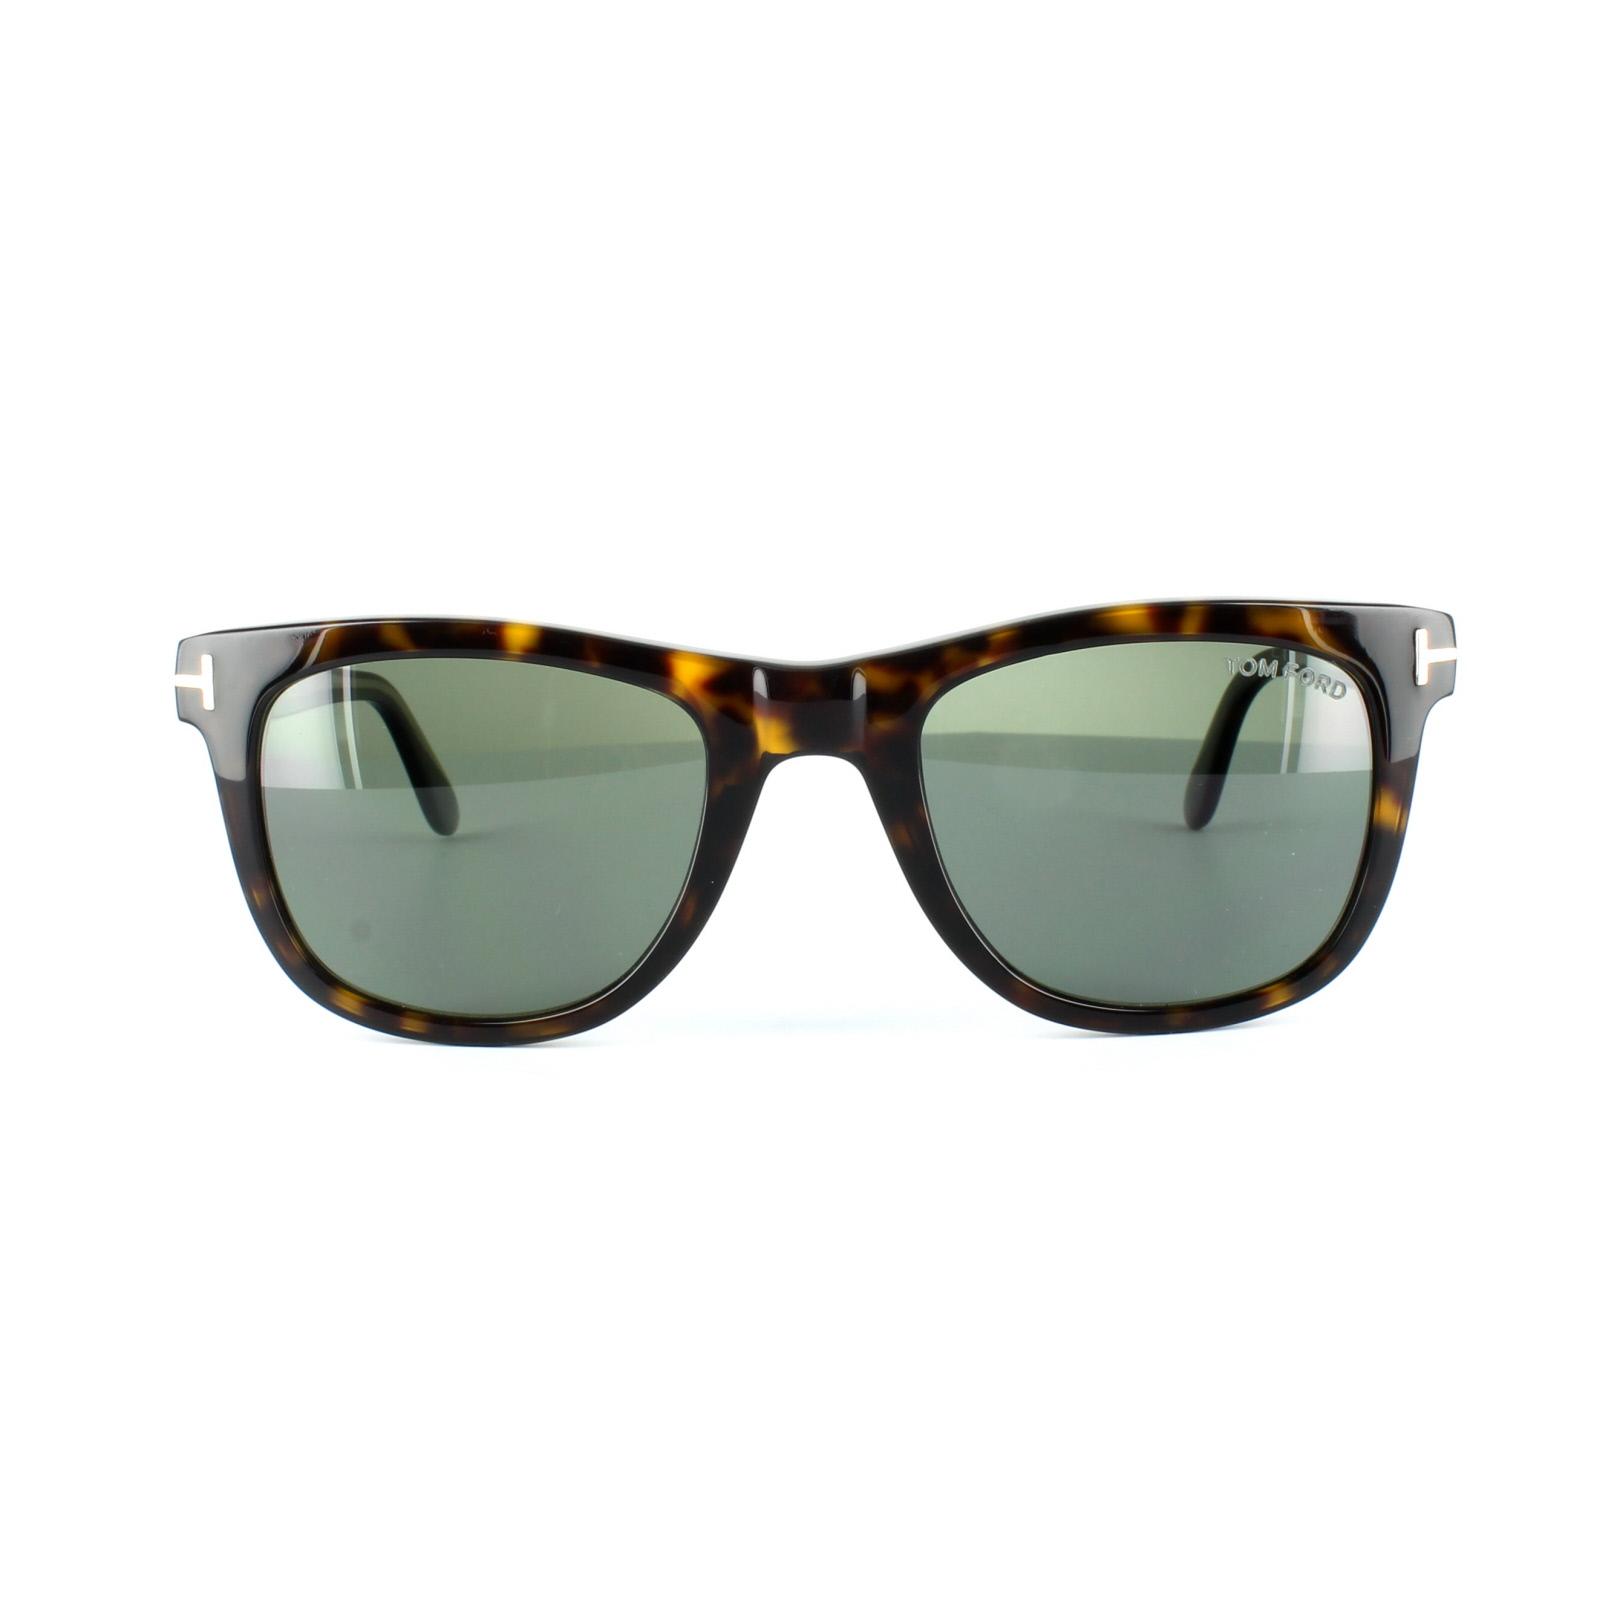 33ee8b2ed7 Sentinel Tom Ford Sunglasses 0336 Leo 56R Havana Brown Green Polarized